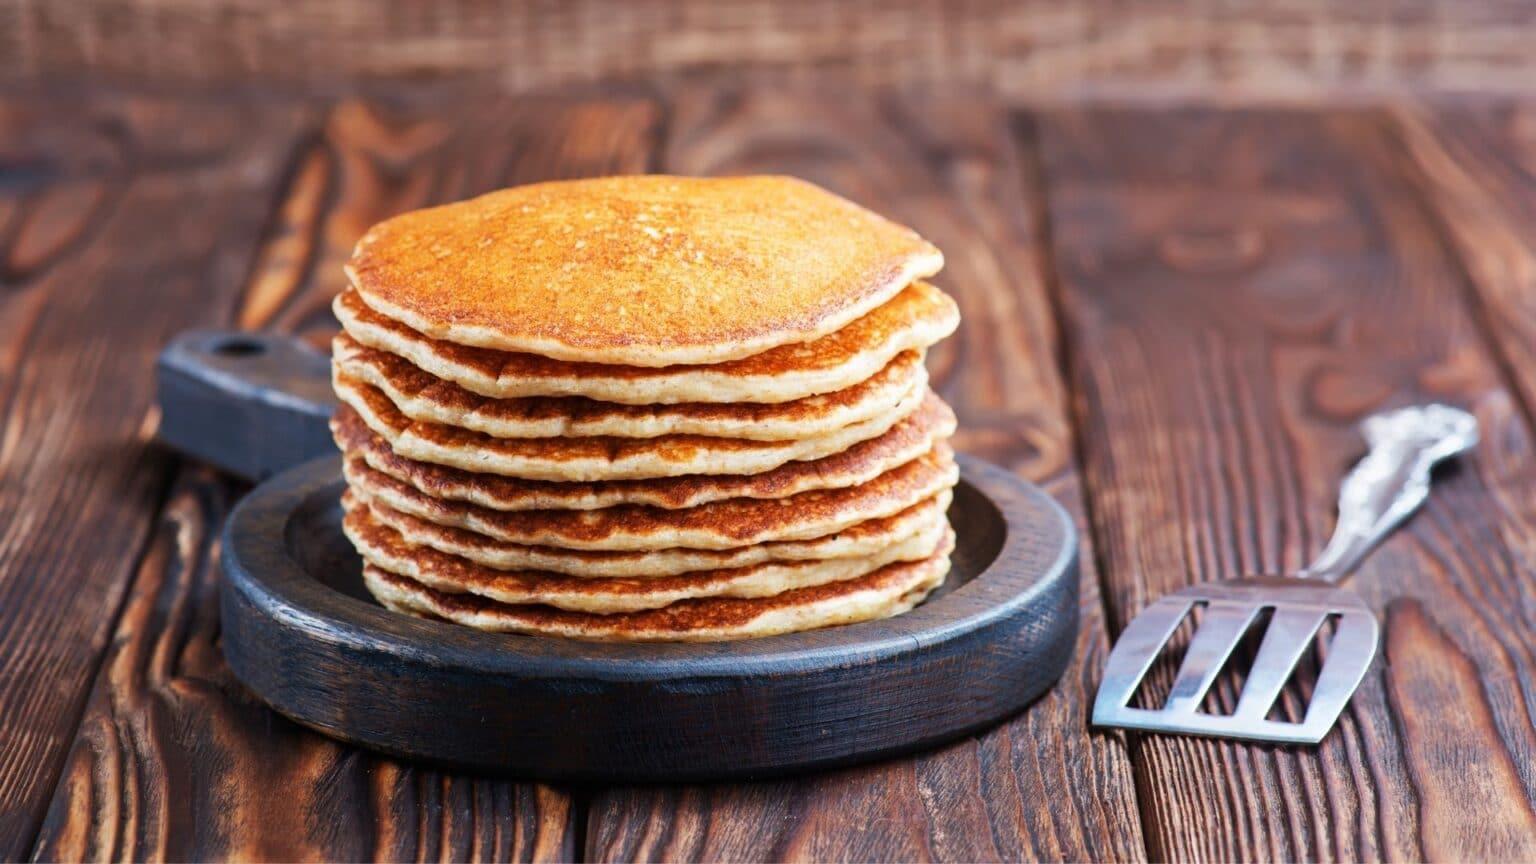 Pancake Pan Types of Materials and Shapes